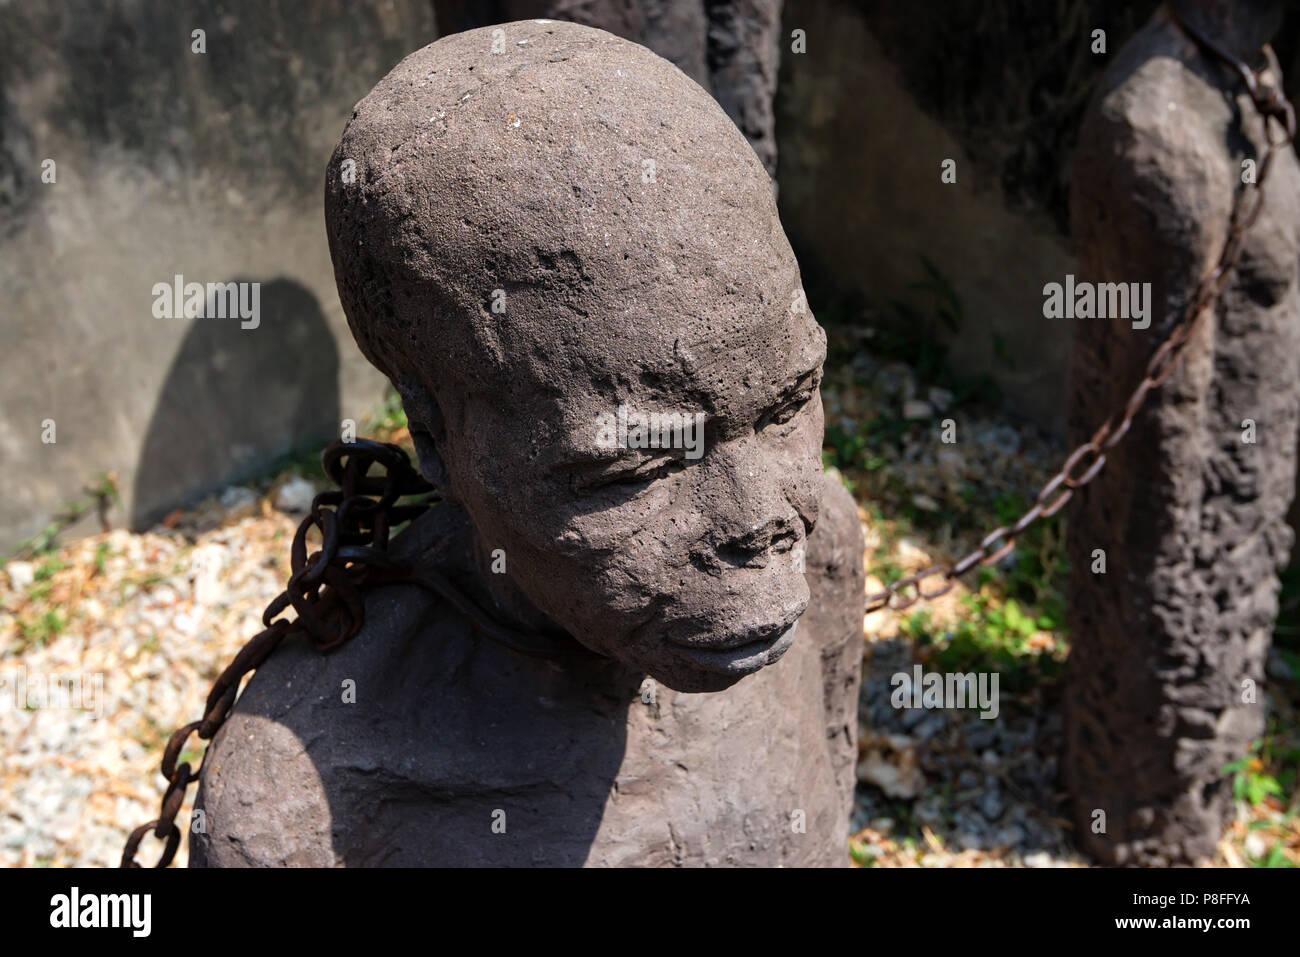 STONE TOWN, ZANZIBAR - JANUARY 9, 2015: Monument of slaves to victims of slavery - Stock Image